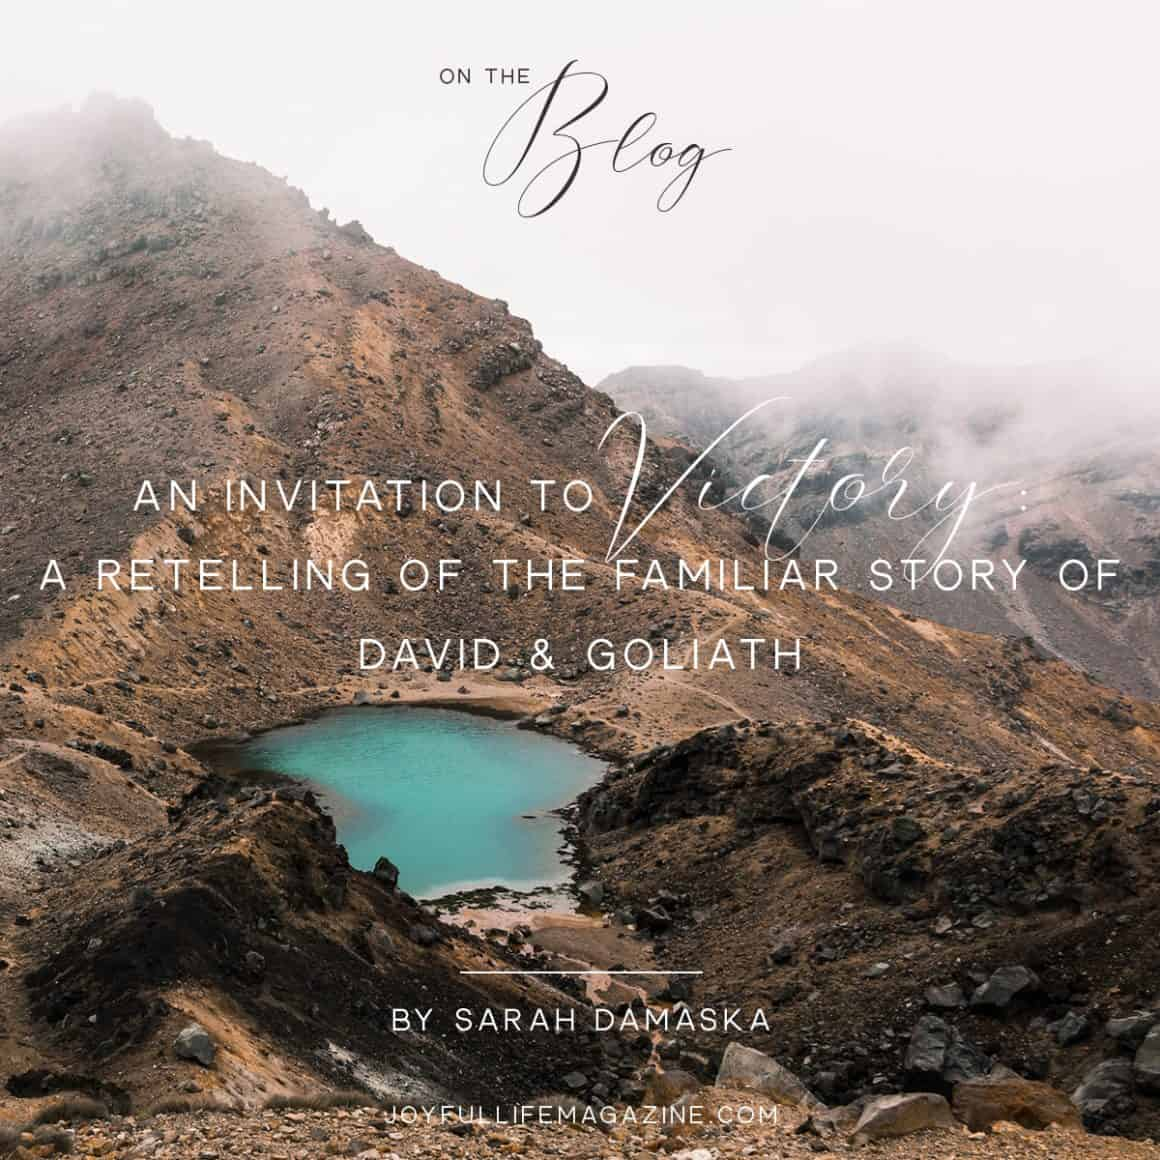 An Invitation to Victory | by Sarah Damaska | The Joyful Life Magazine